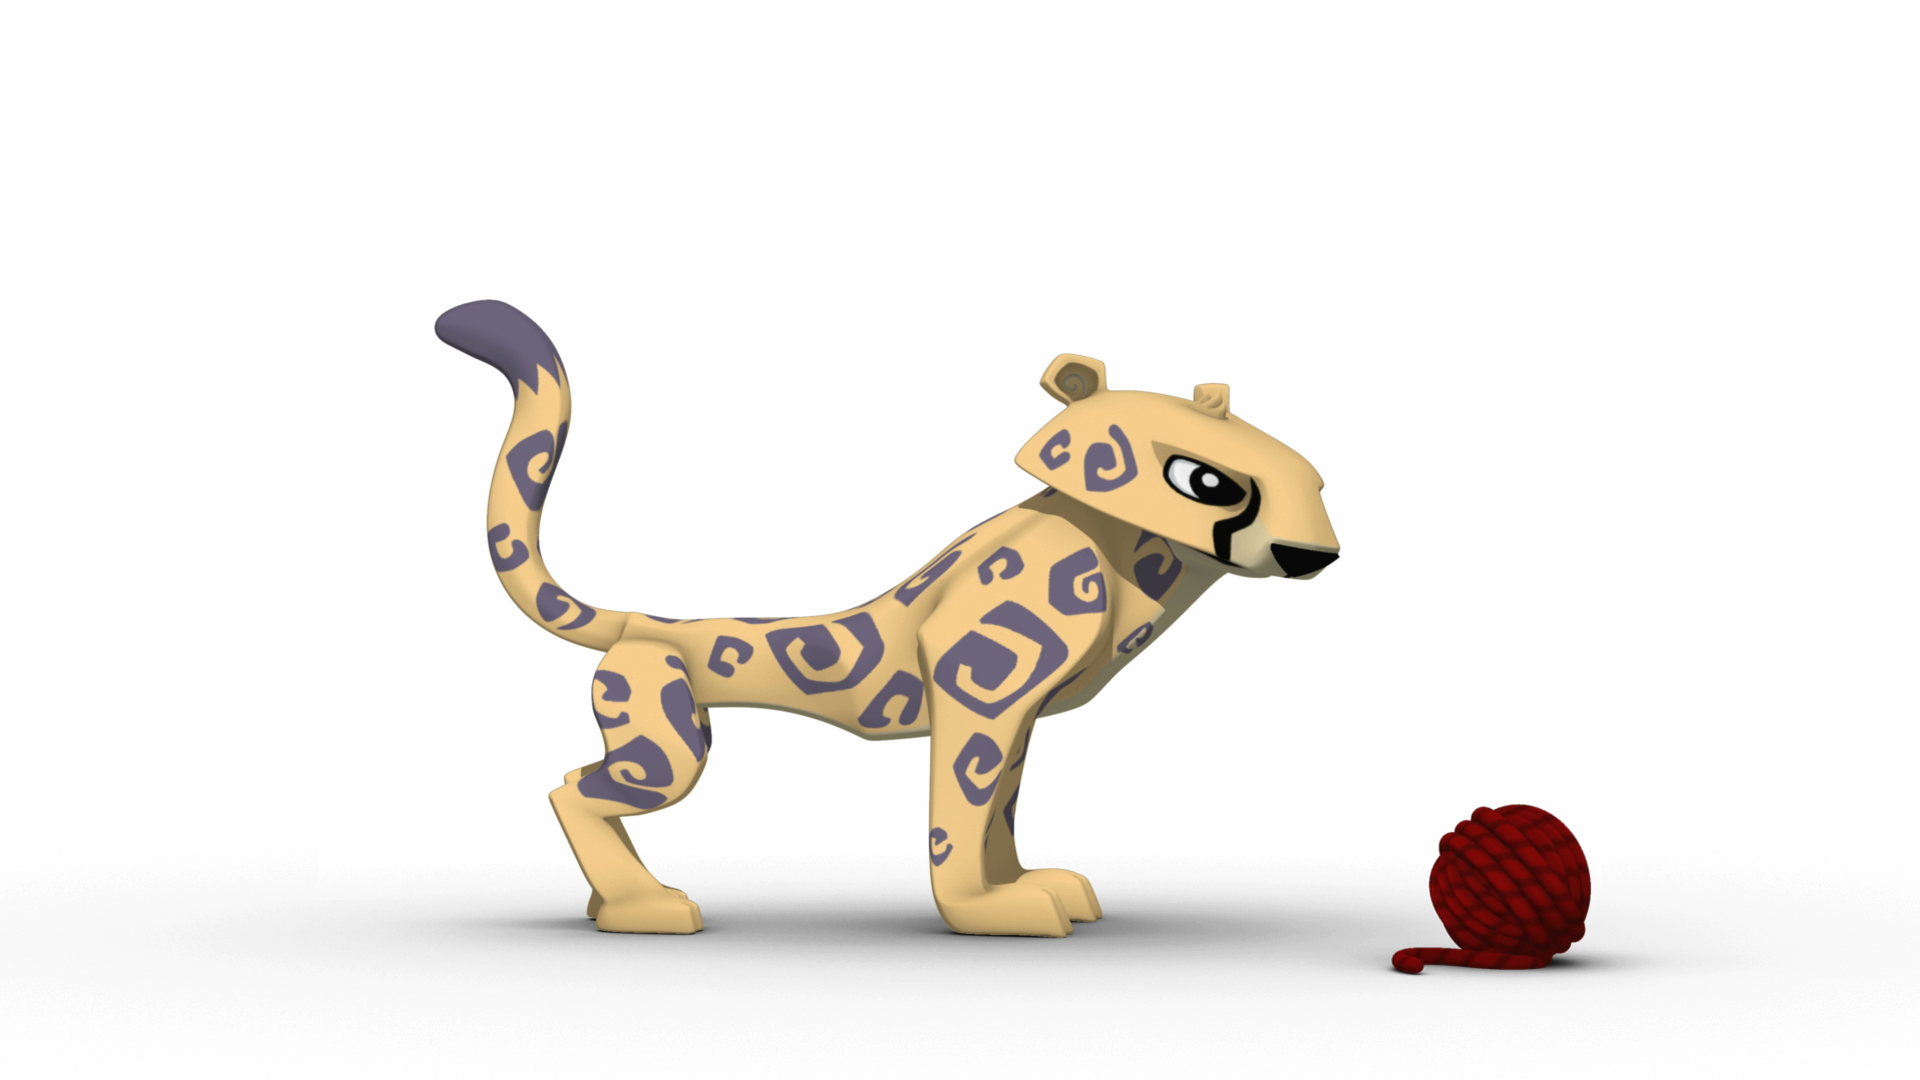 jaguar rh kids nationalgeographic com Jaguar Internal Anatomy Jaguar Animal Life Cycle